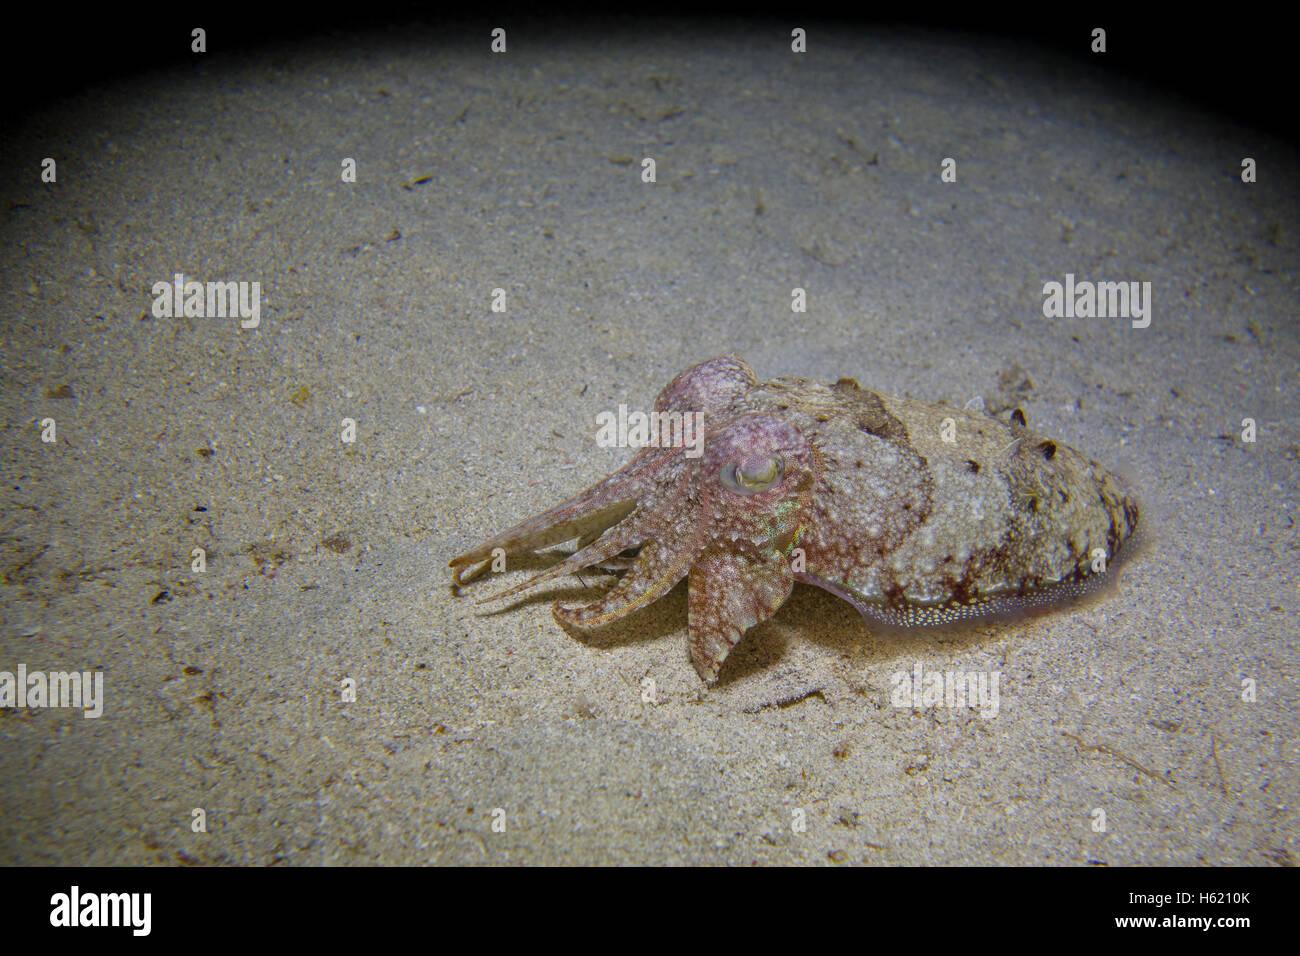 Common cuttlefish, Sepia officinalis, in the Mediterranean Sea in Malta - Stock Image